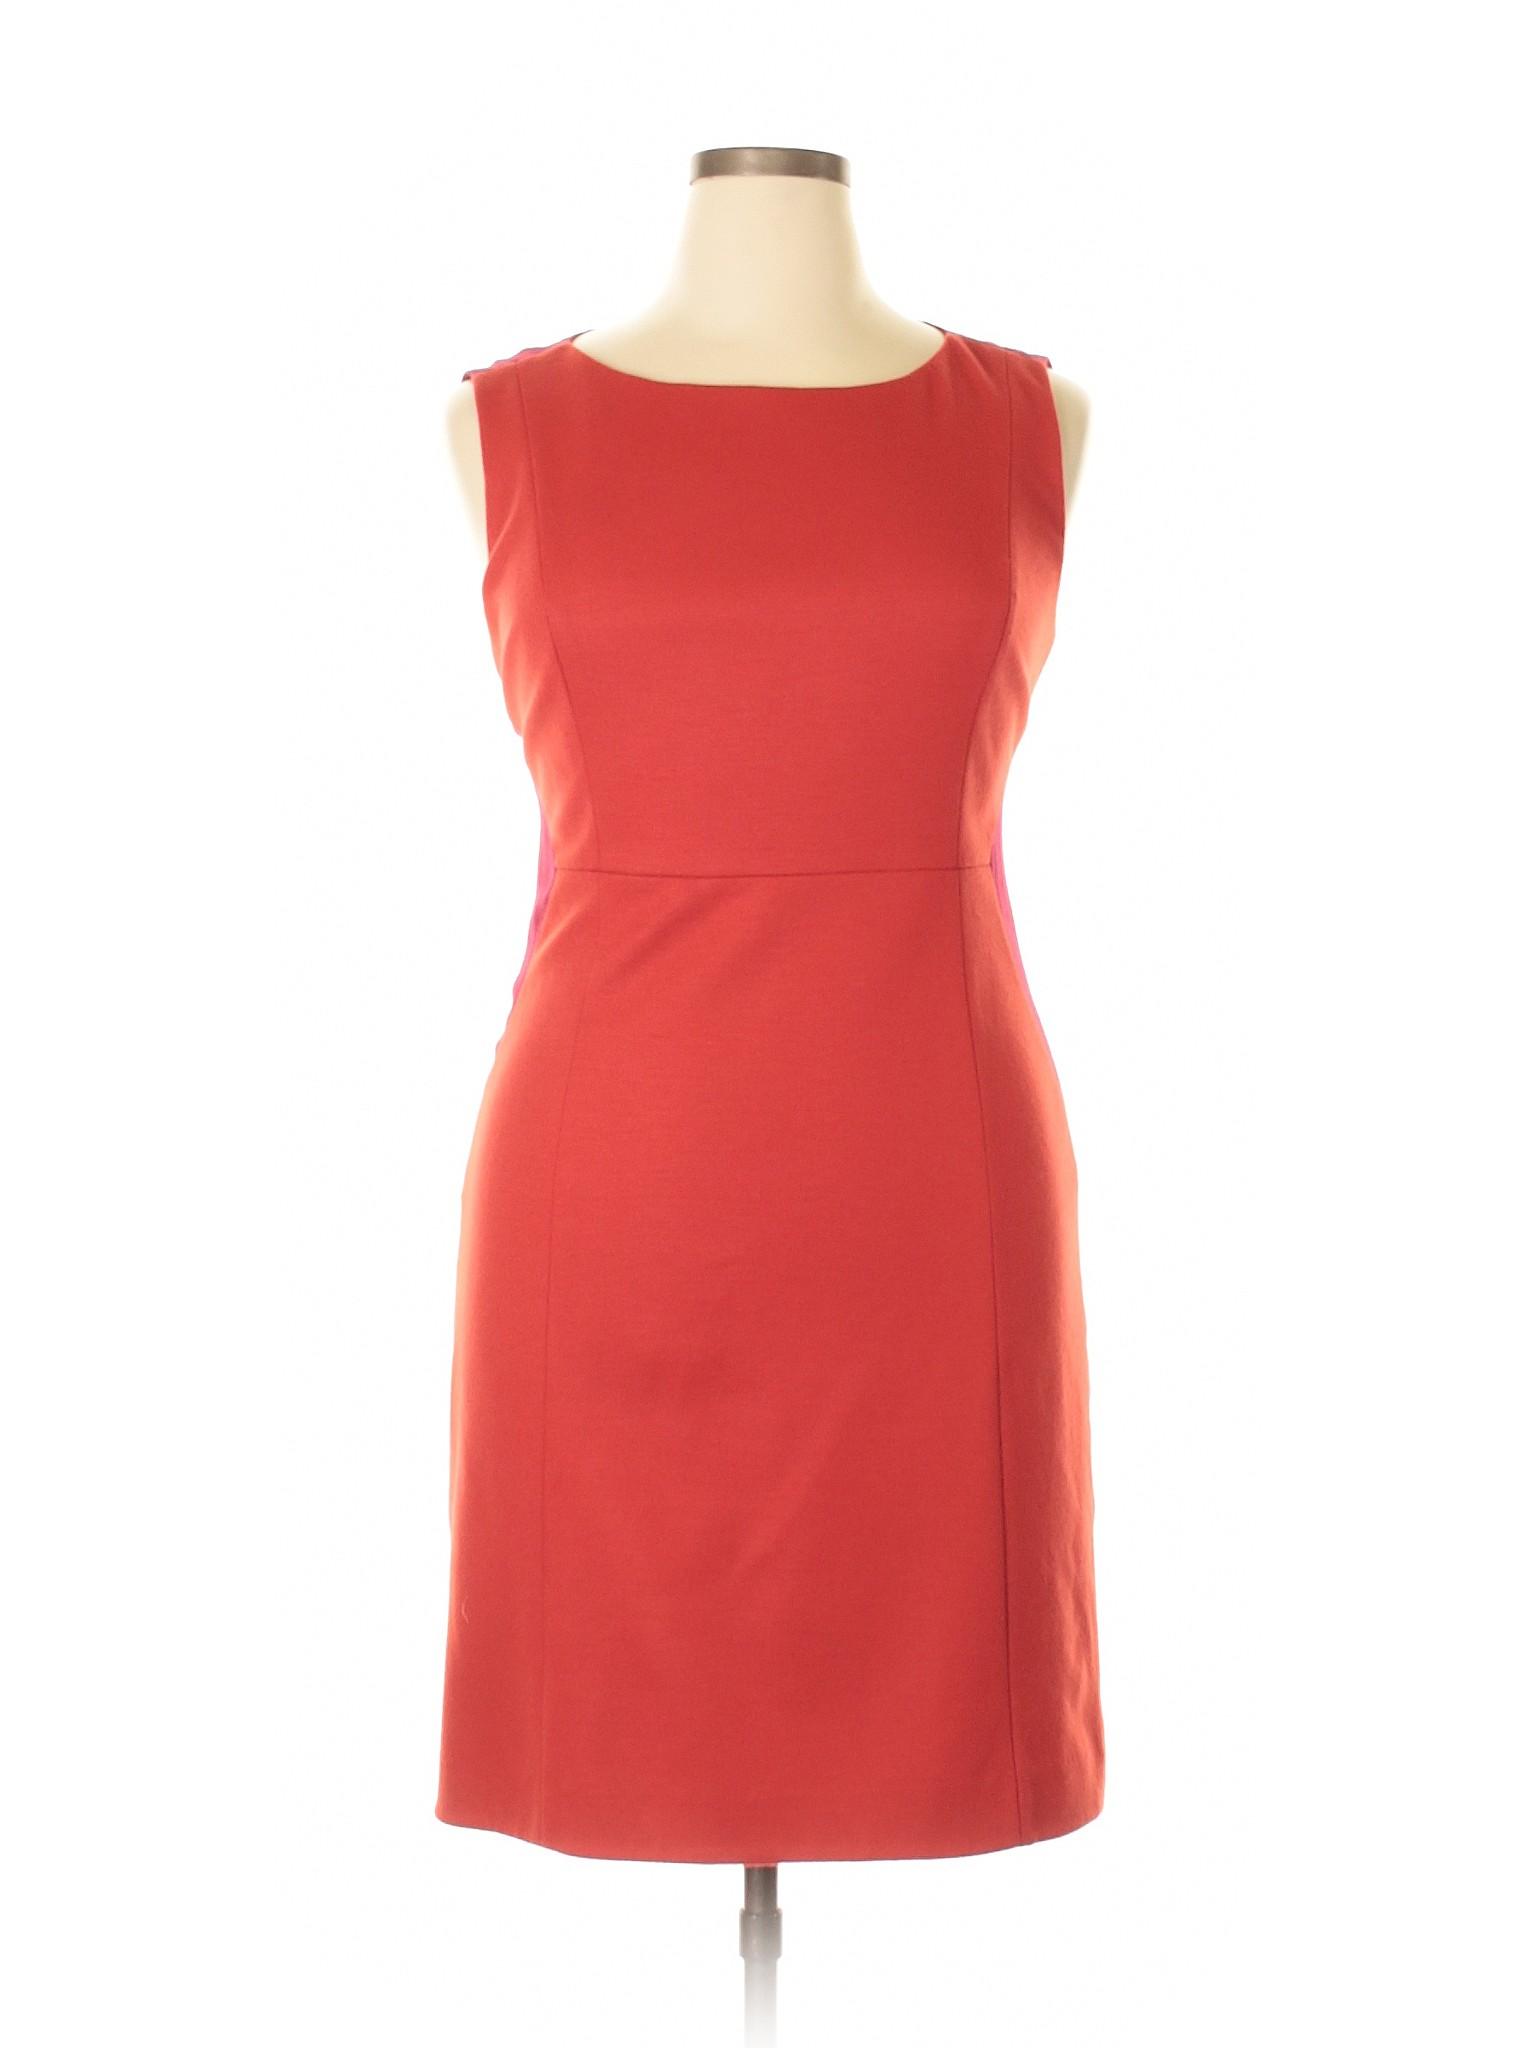 Tahari Dress Selling Casual Elie Selling Elie wxXq7Ytc